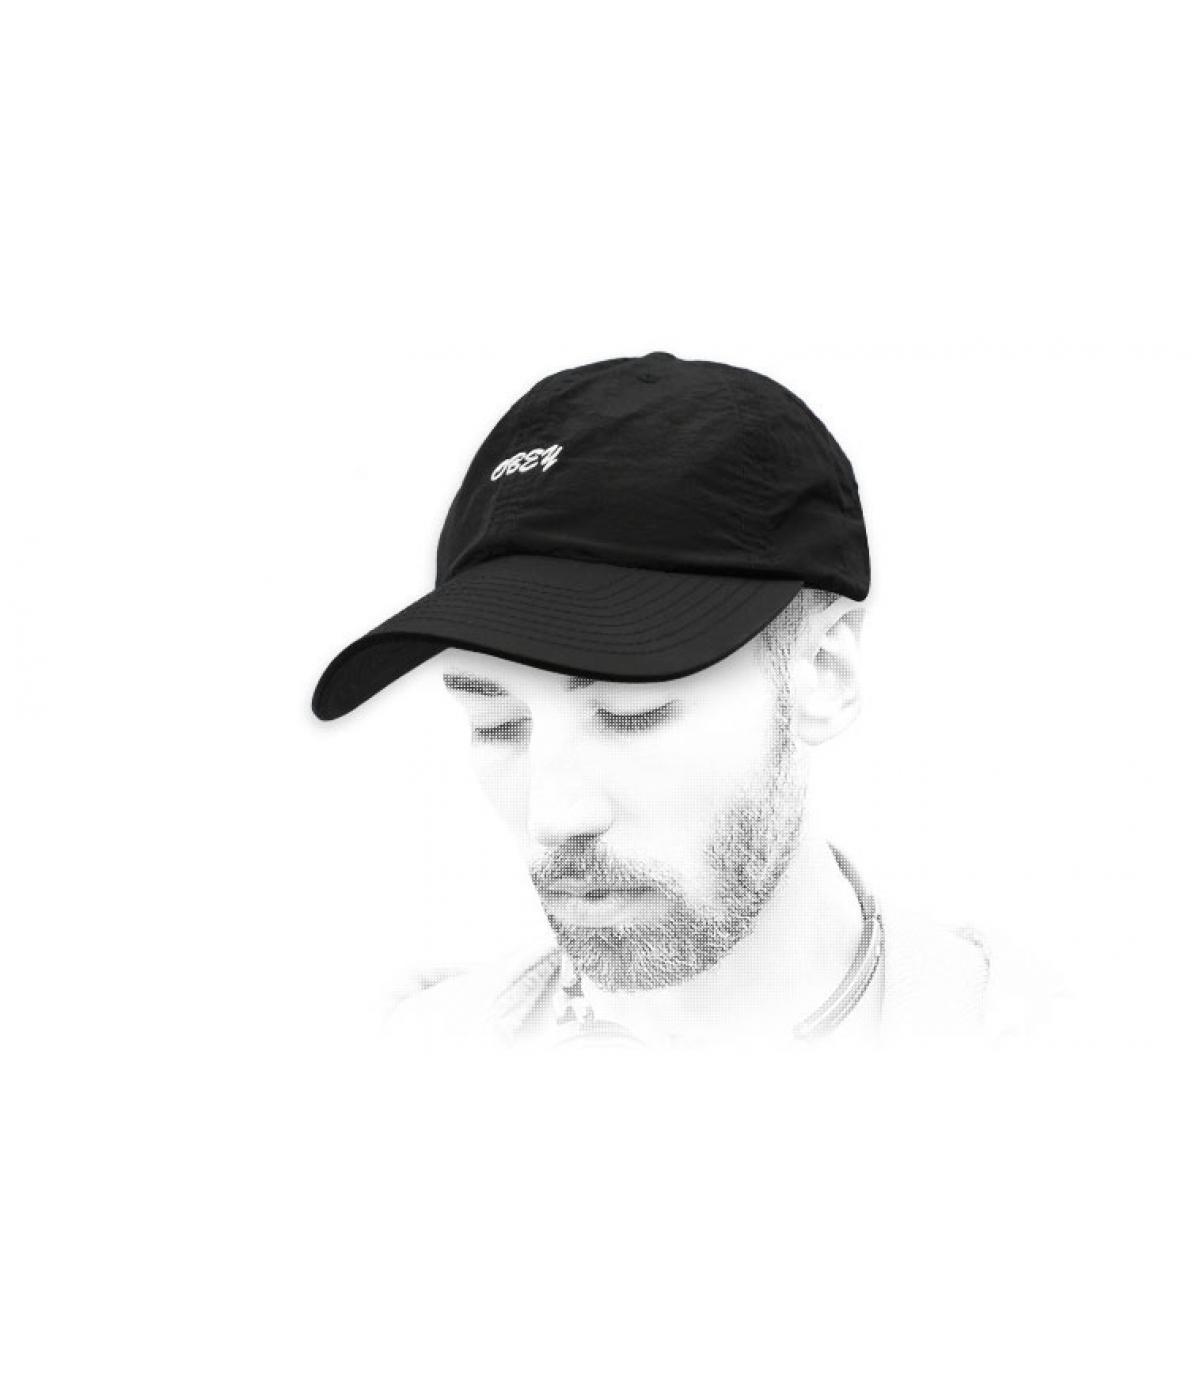 zwart Obey cap